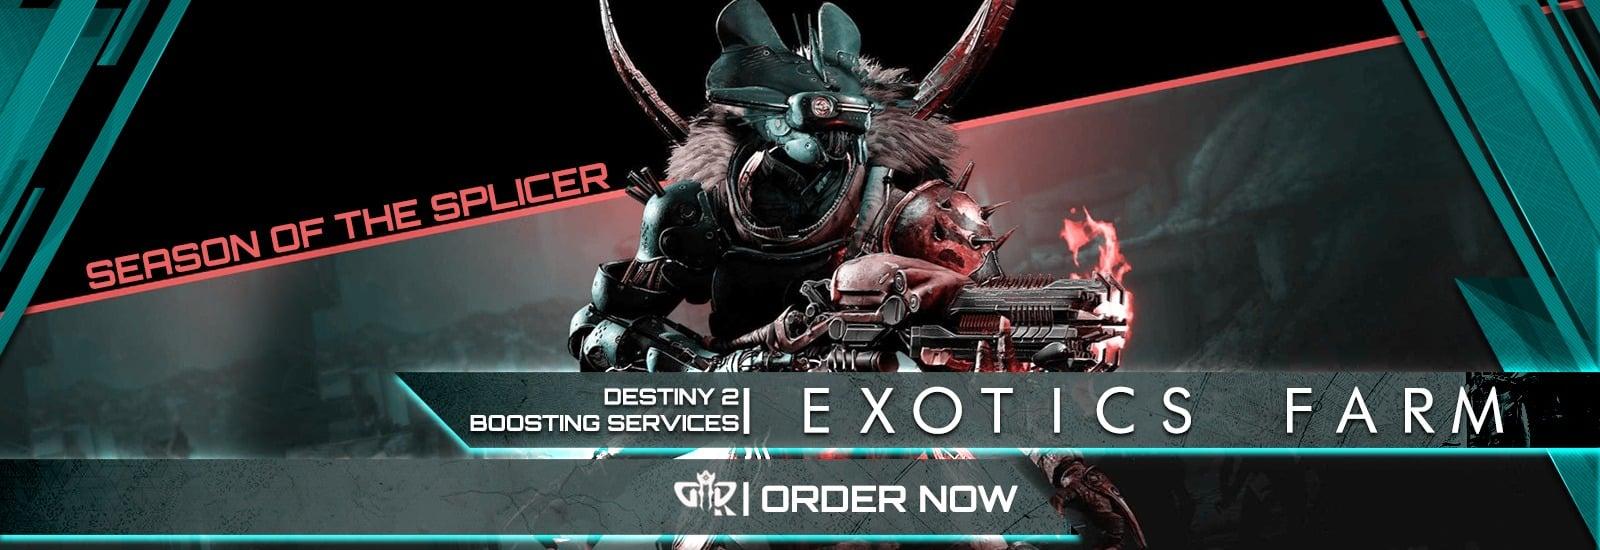 Destiny 2 Boosting - Season of the Splicer Exotics Farming Services